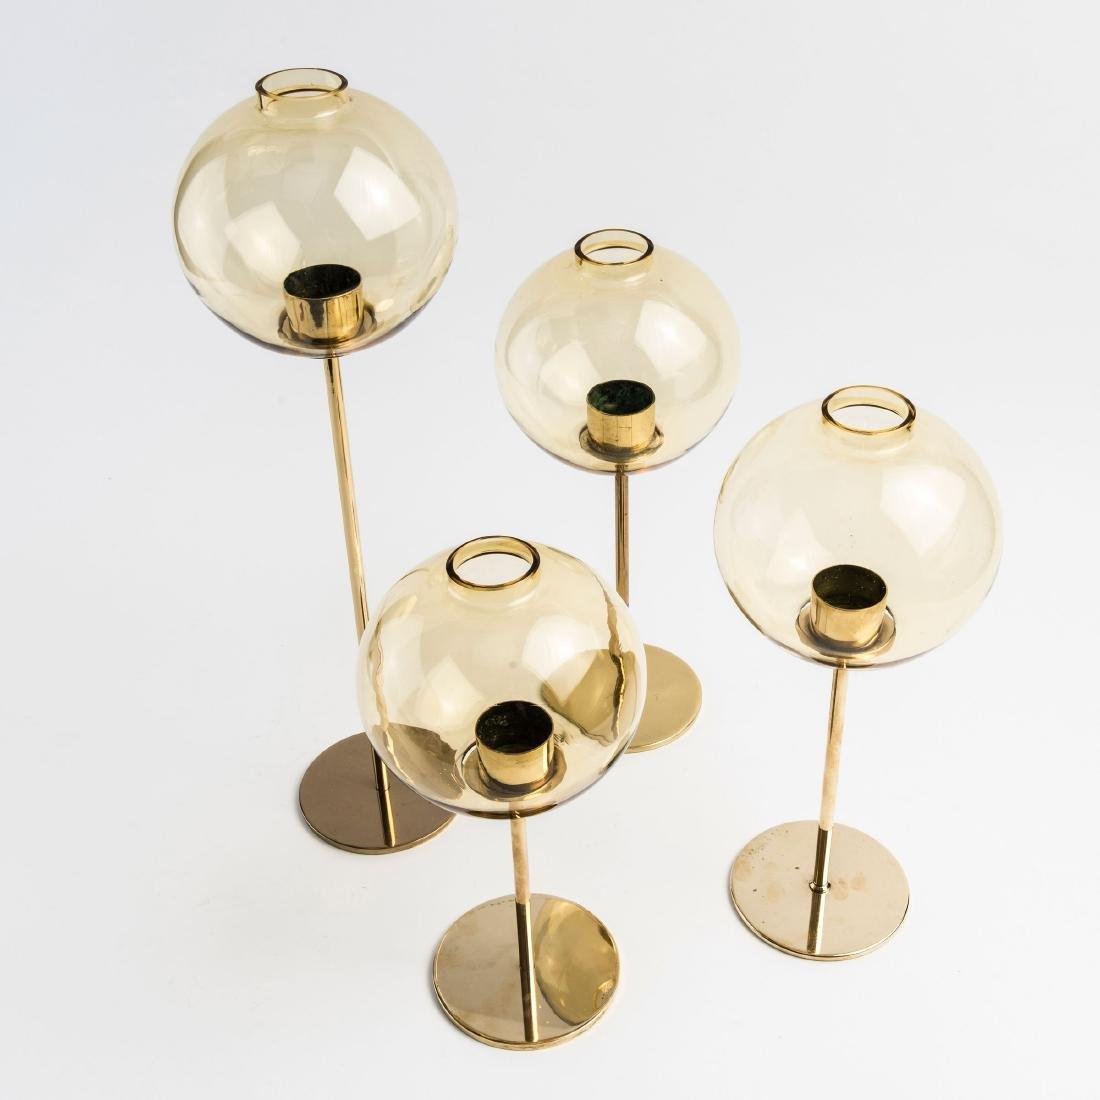 Four '135' lanterns, c. 1960 - 2